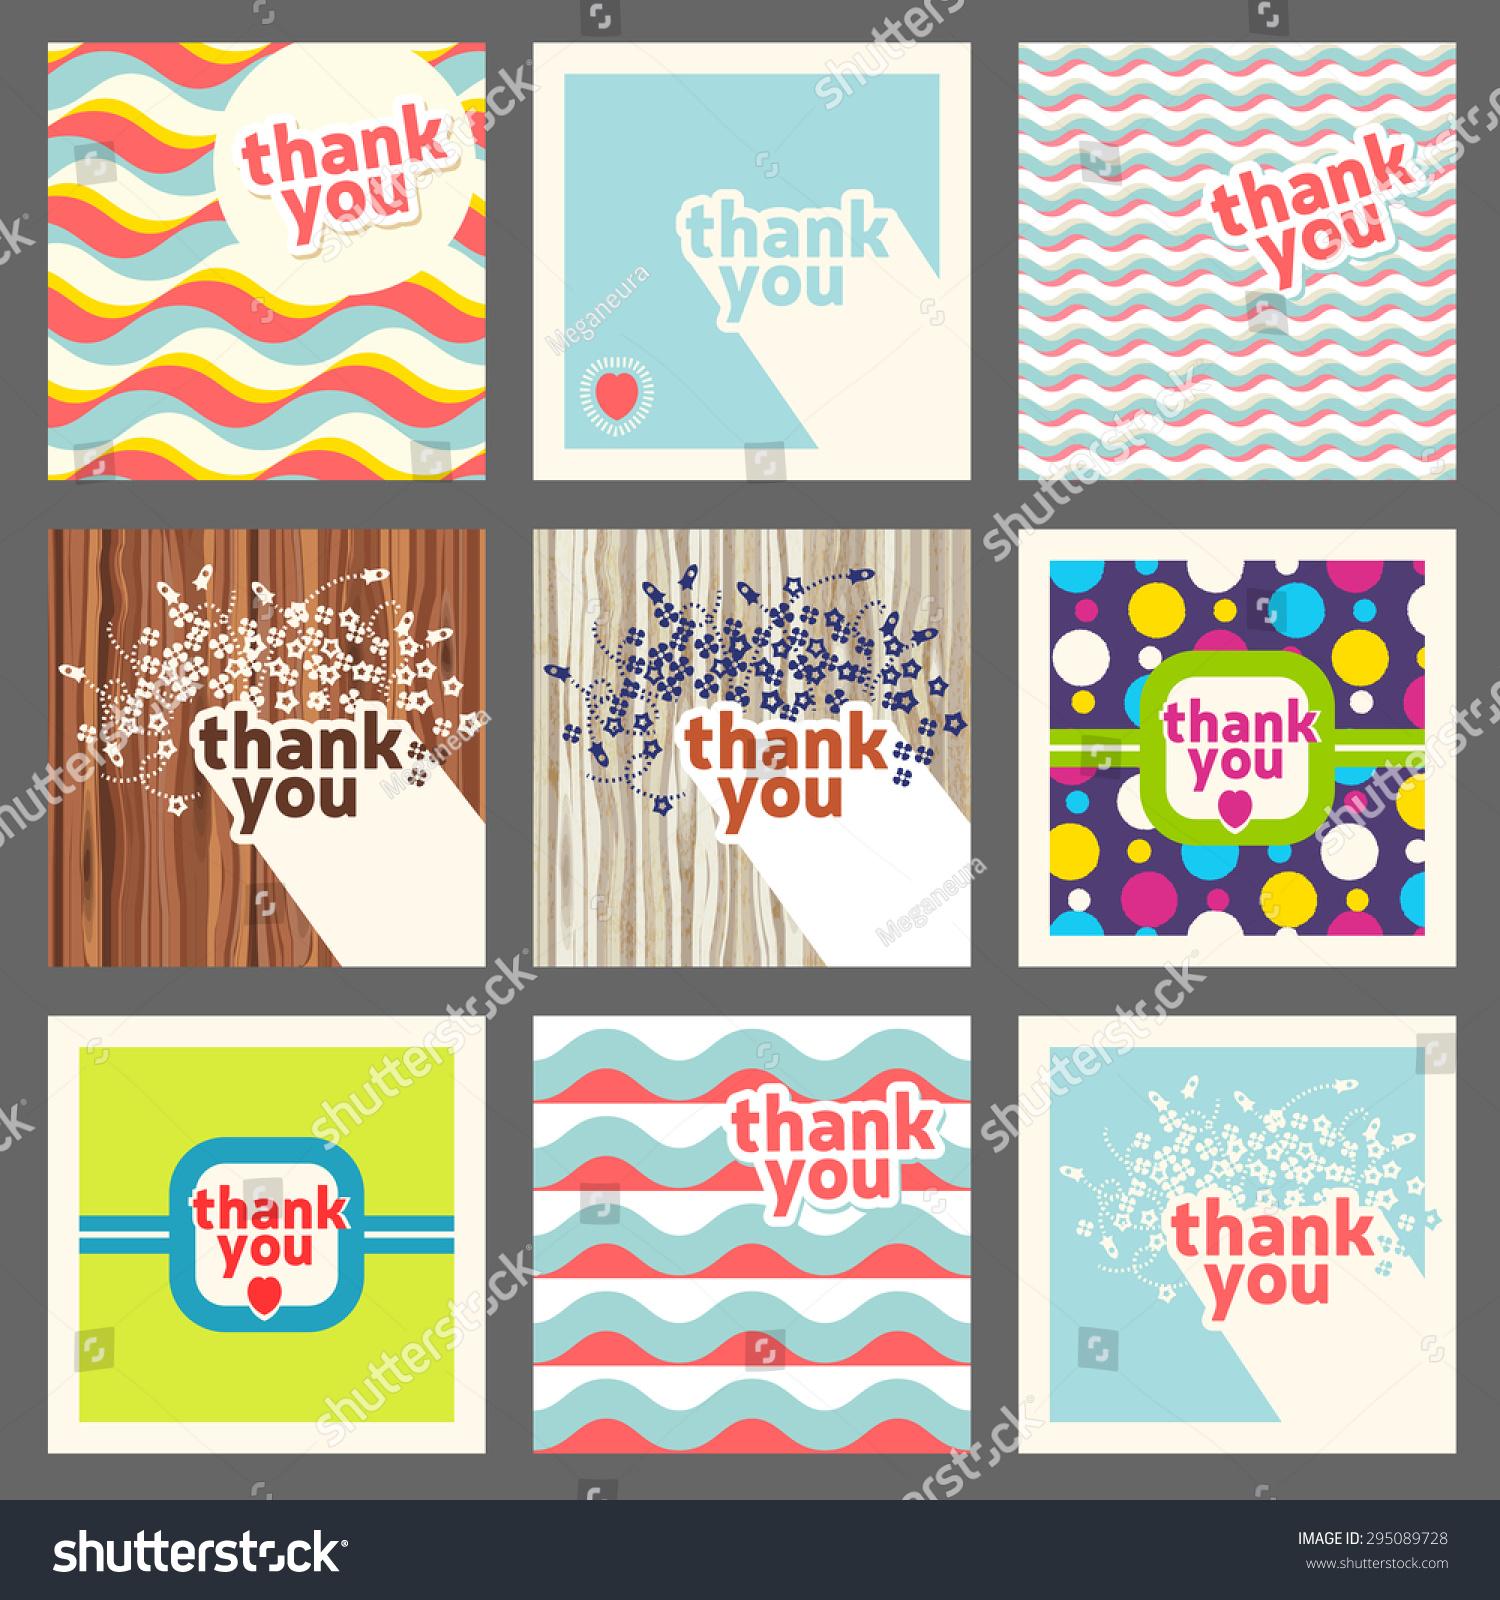 Thank you card design template set. Retro style